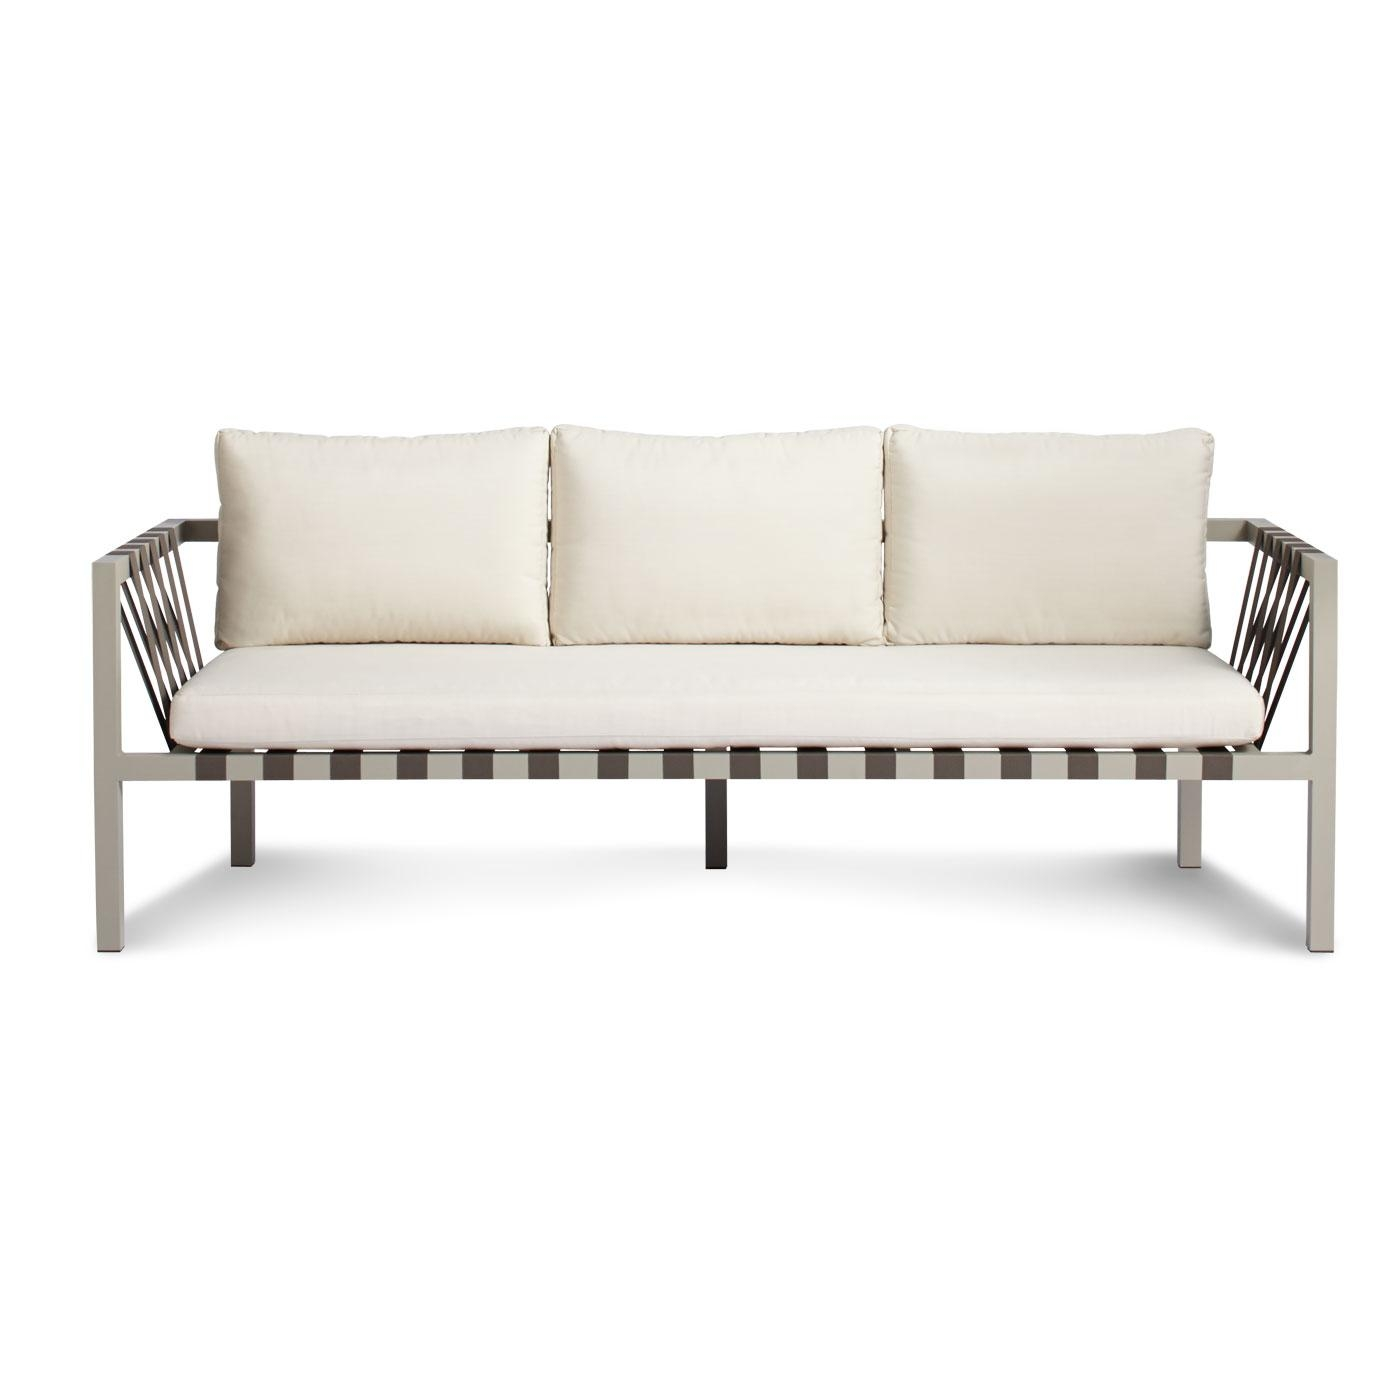 Jibe Outdoor 3 Seat Sofa - Modern Outdoor Sofas | Blu Dot in Blu Dot Sofas